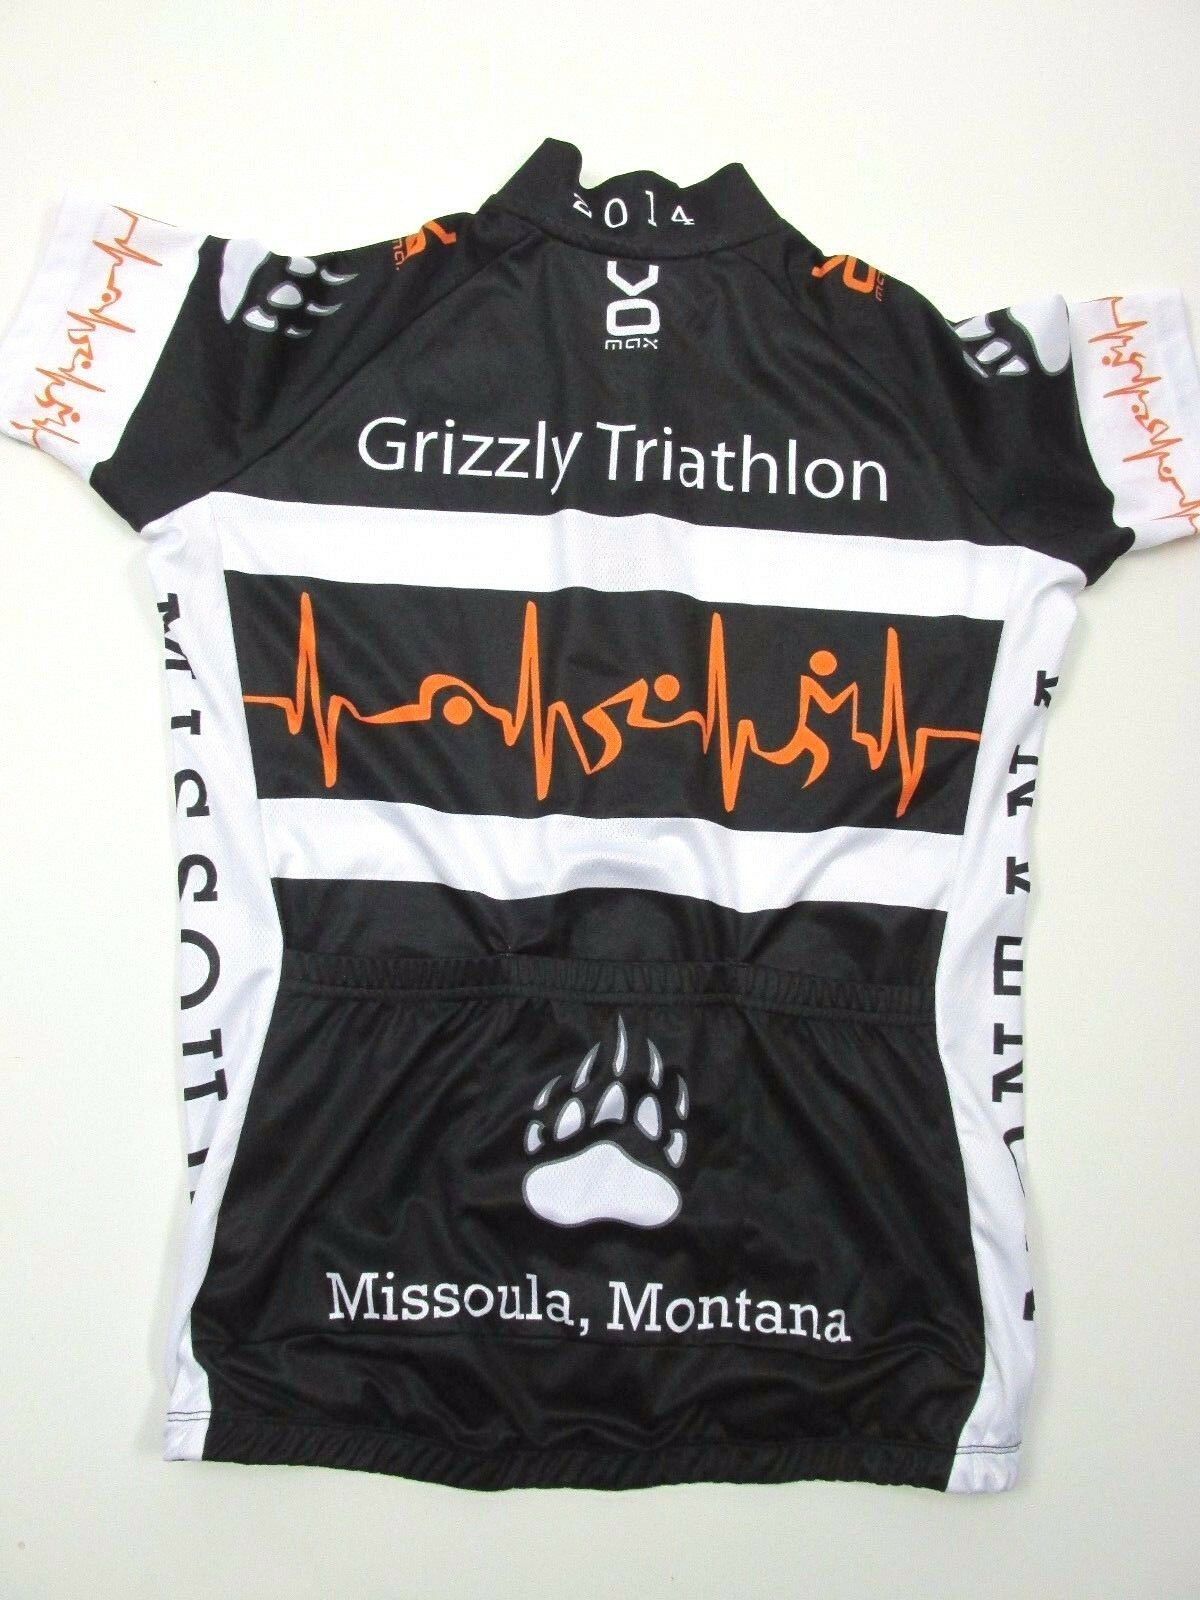 VOmax Grizzly Triathlon Missoula Montana 2014 Cycling Jersey Wouomo Smtutti MB32